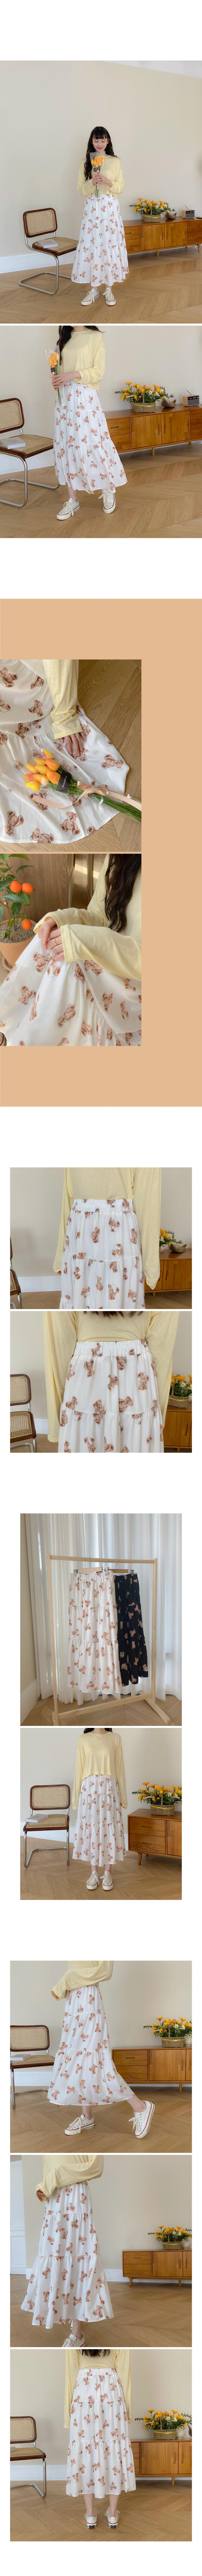 Big Size 26-38 Inch Bears Banding Long Cancan Skirt